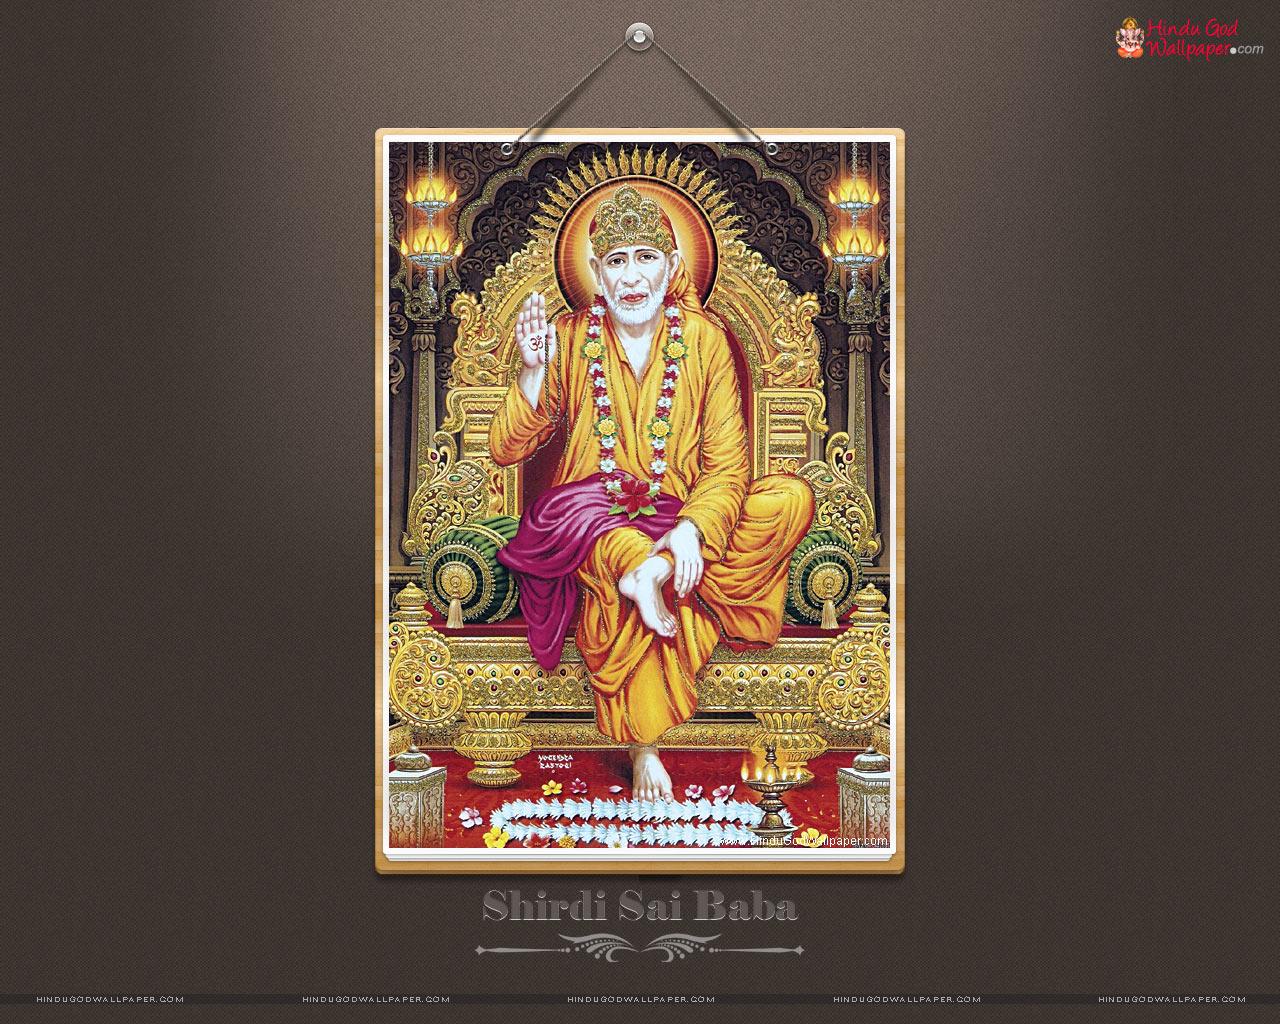 shirdi sai baba pics free download